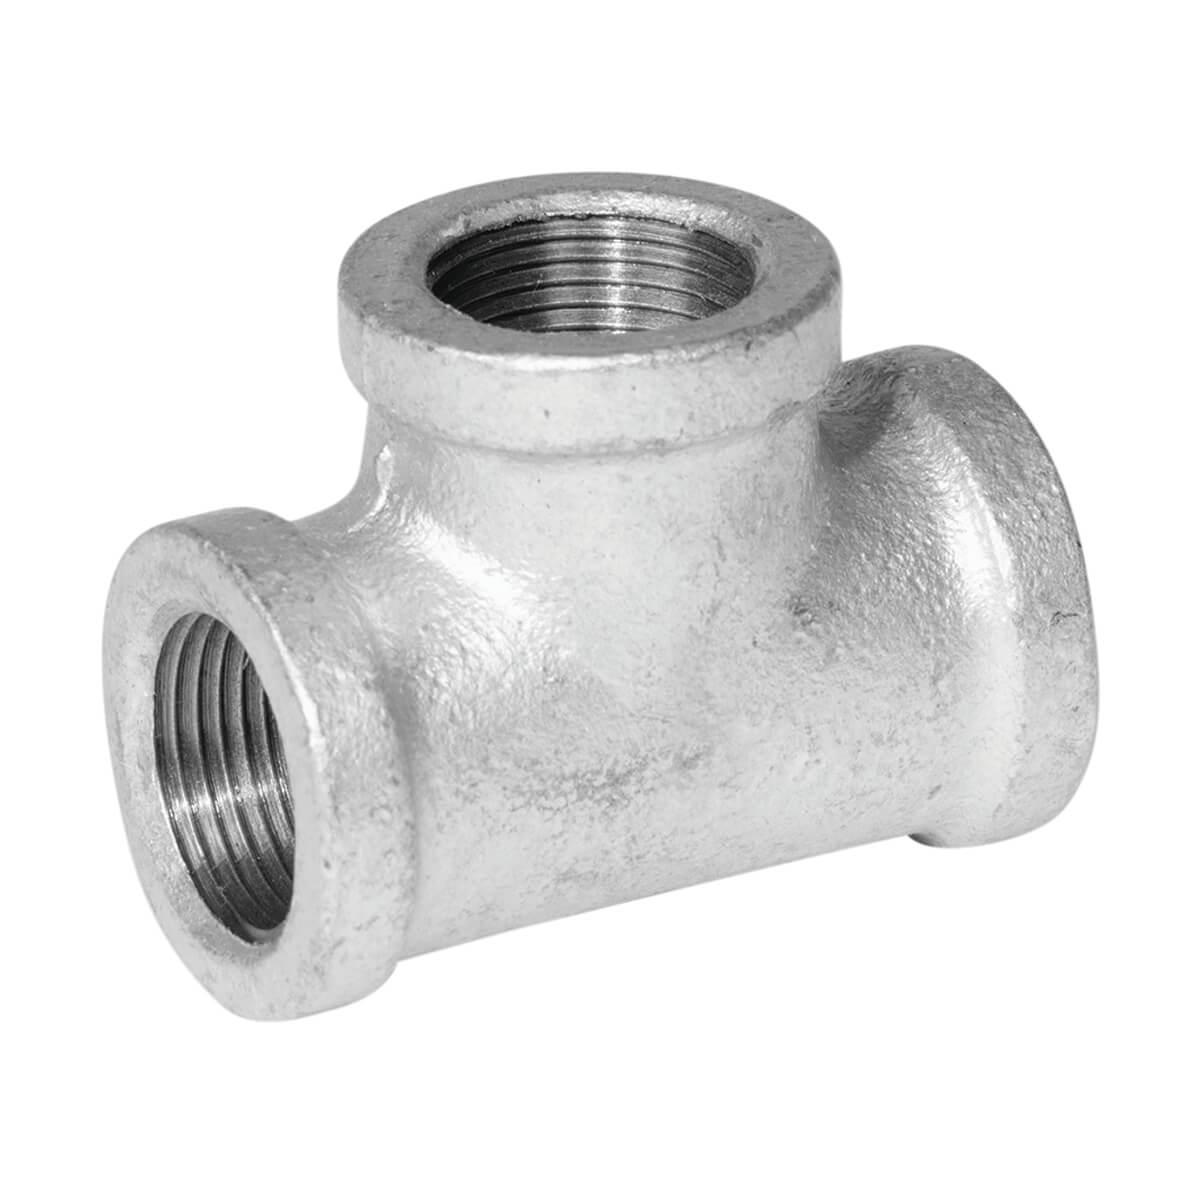 Fitting Galvanized Iron Tee - 3/8-in